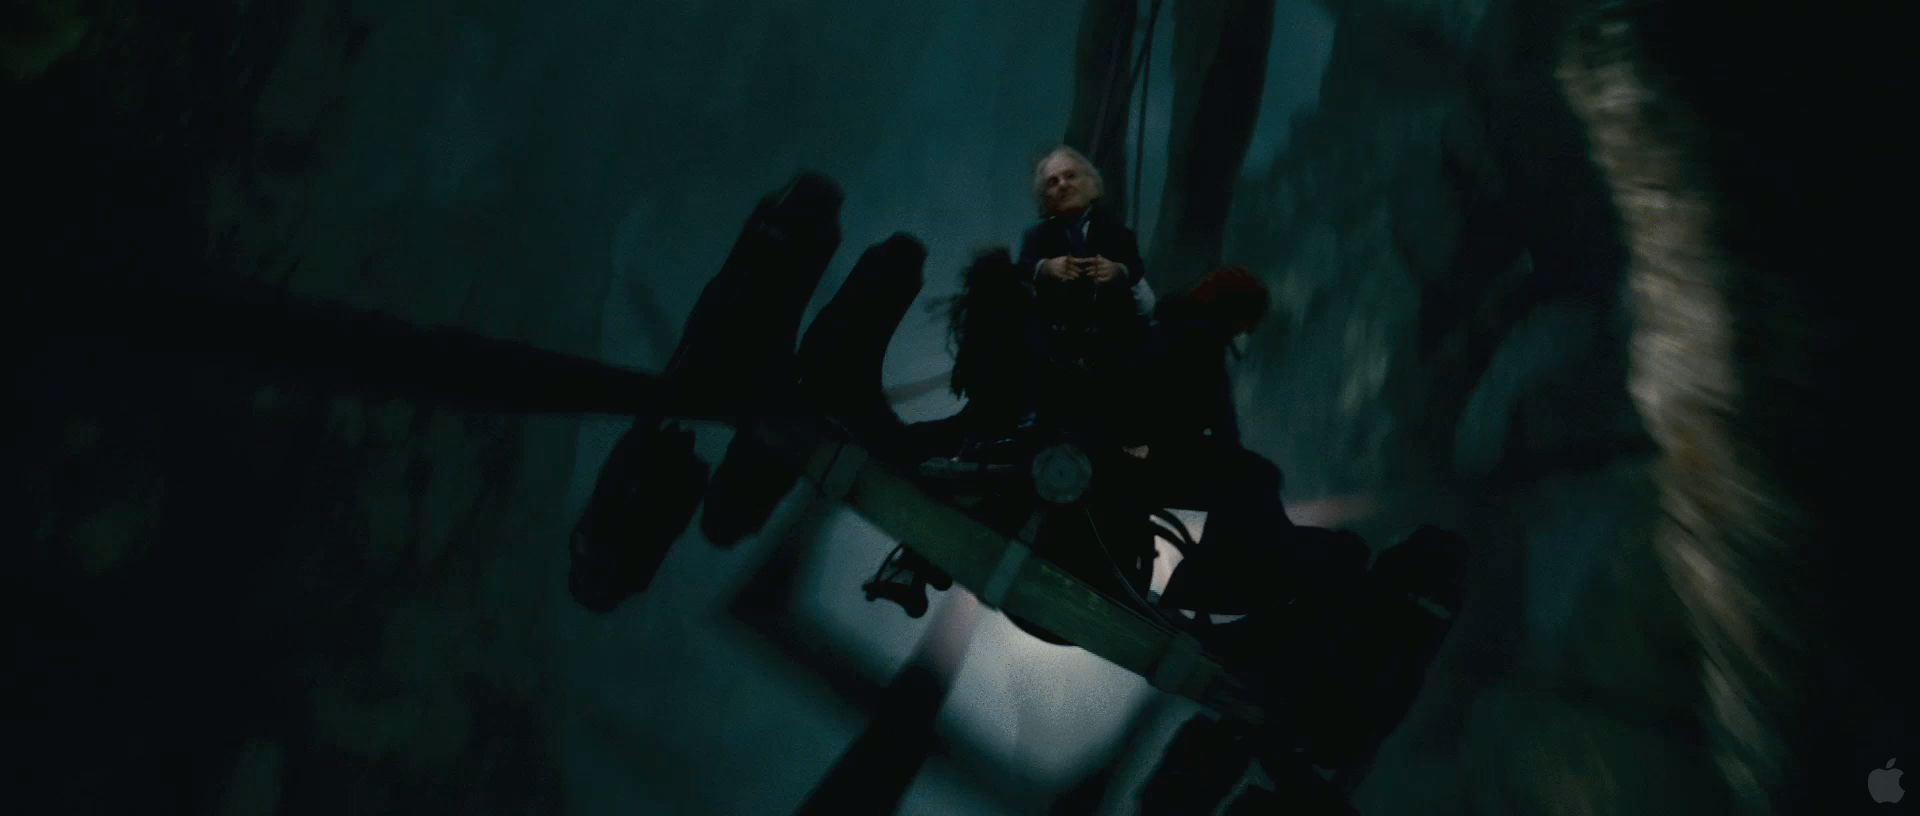 Harry Potter BlogHogwarts HP7 2 Trailer 22